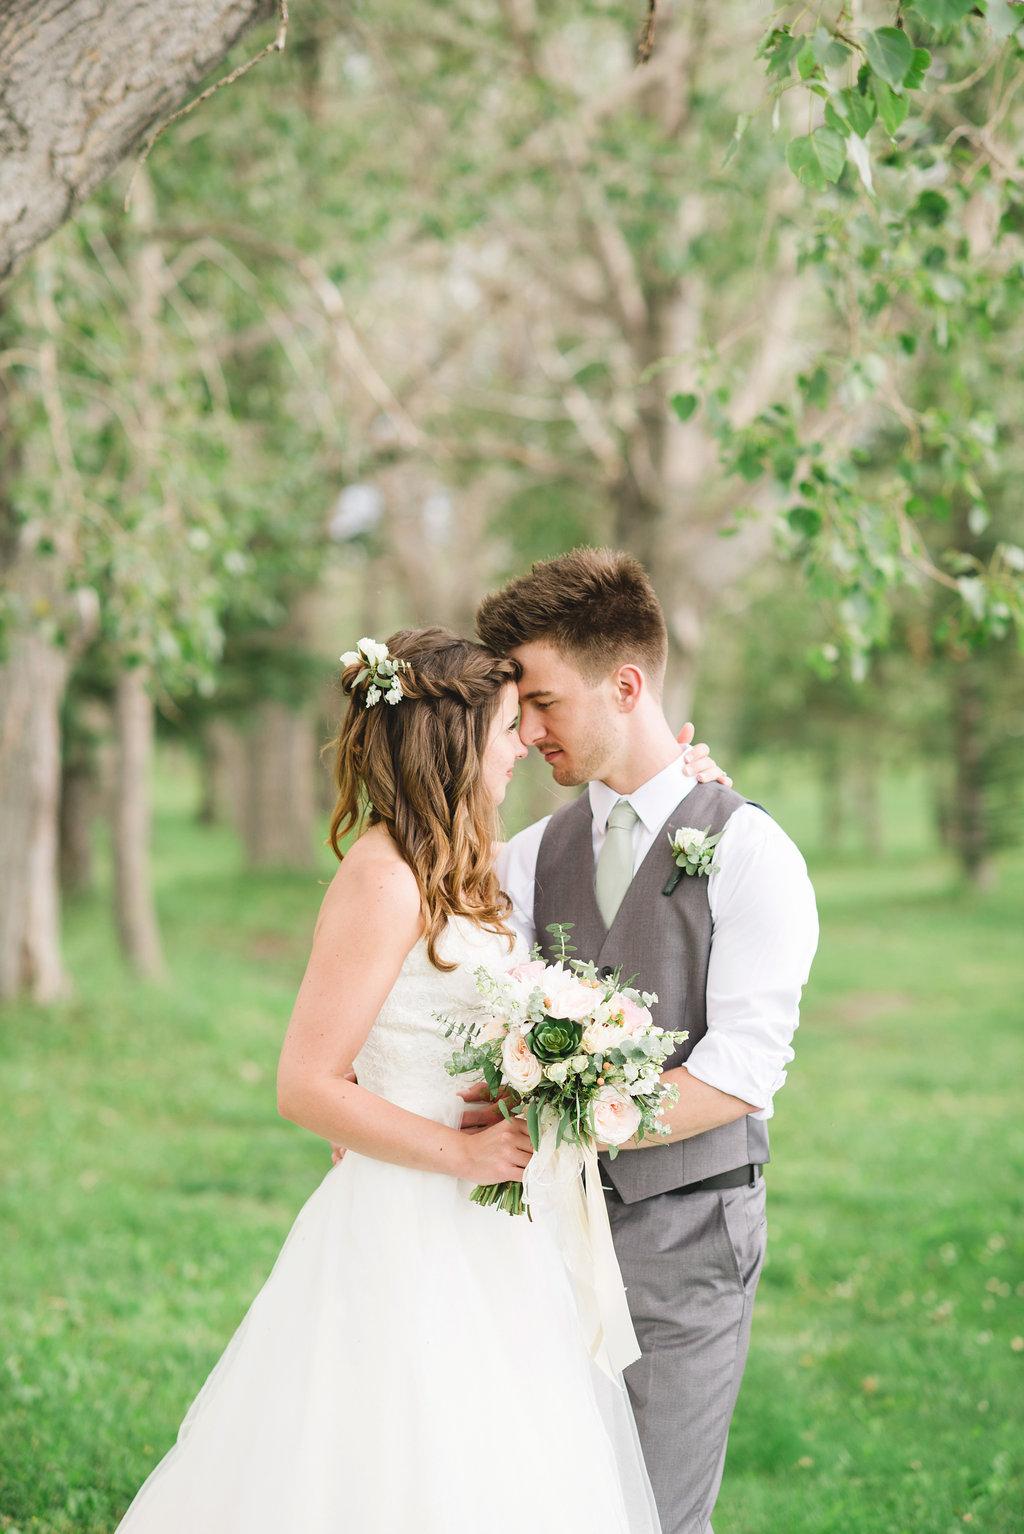 Rustic wedding bouquet and boutonnière